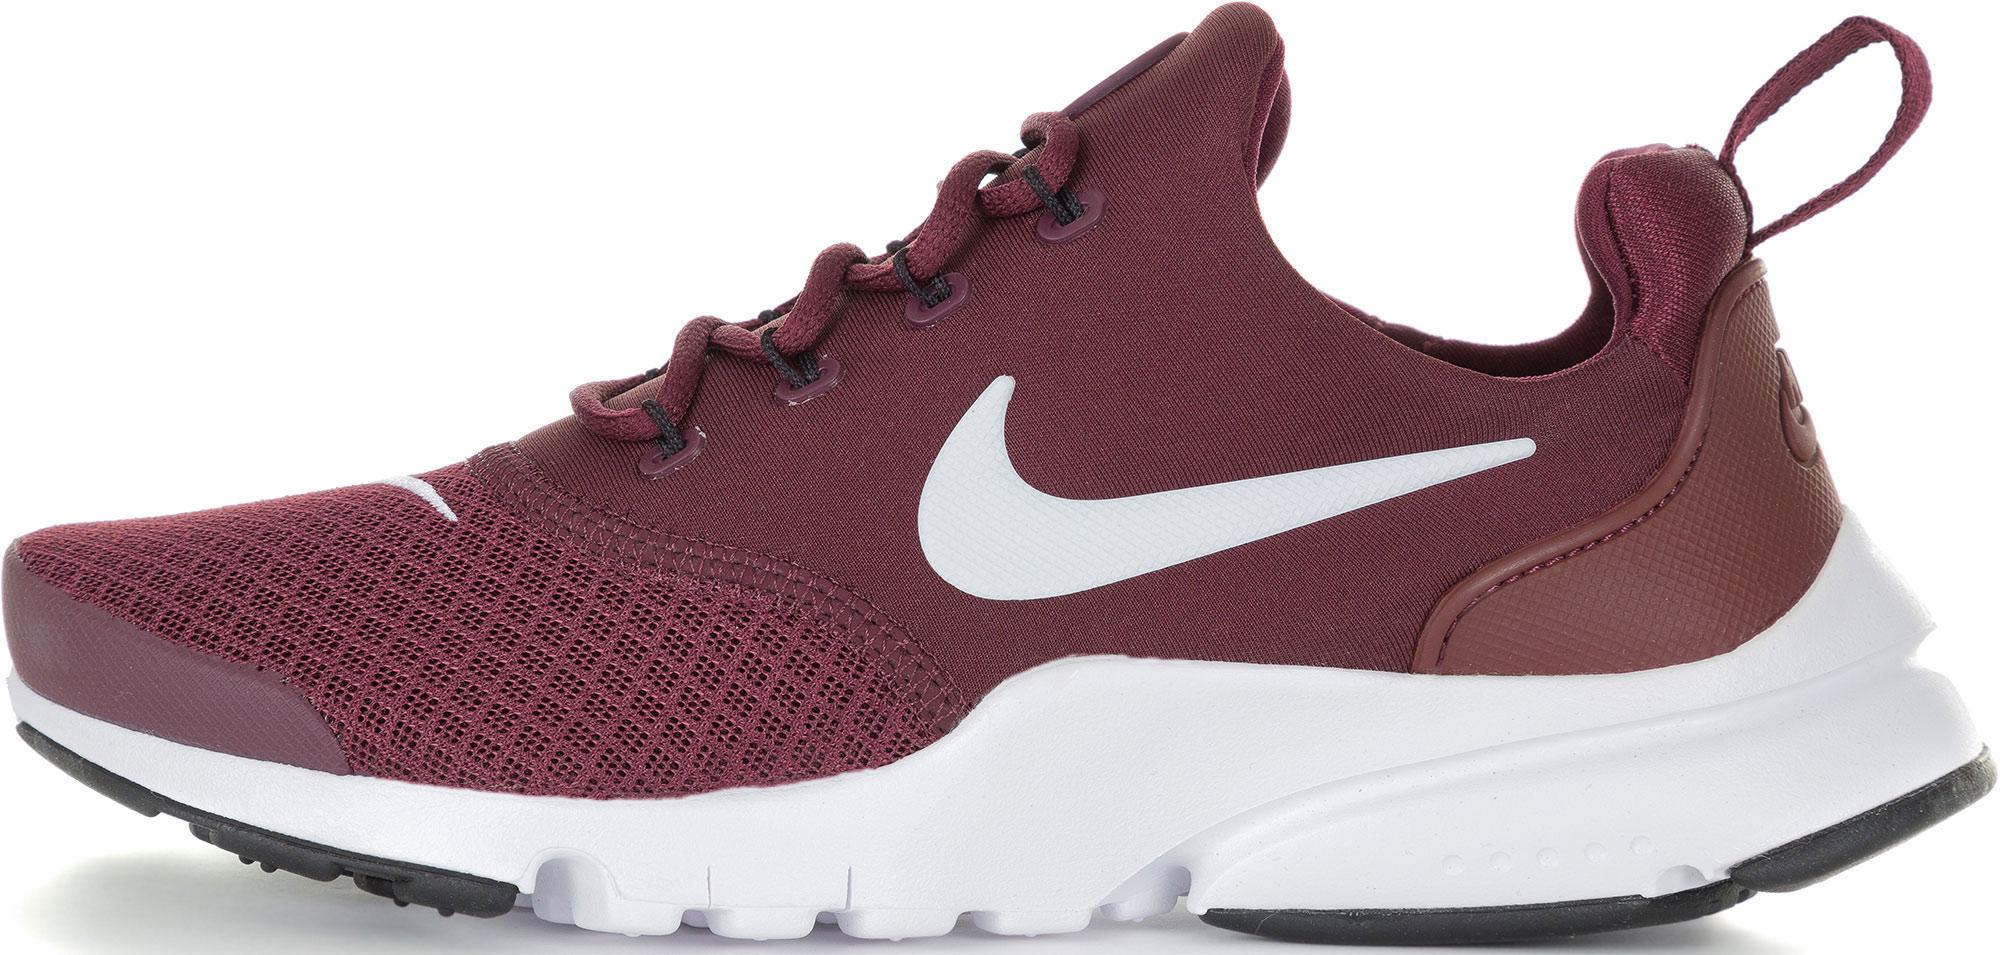 Nike Кроссовки для девочек Nike Presto Fly, размер 35